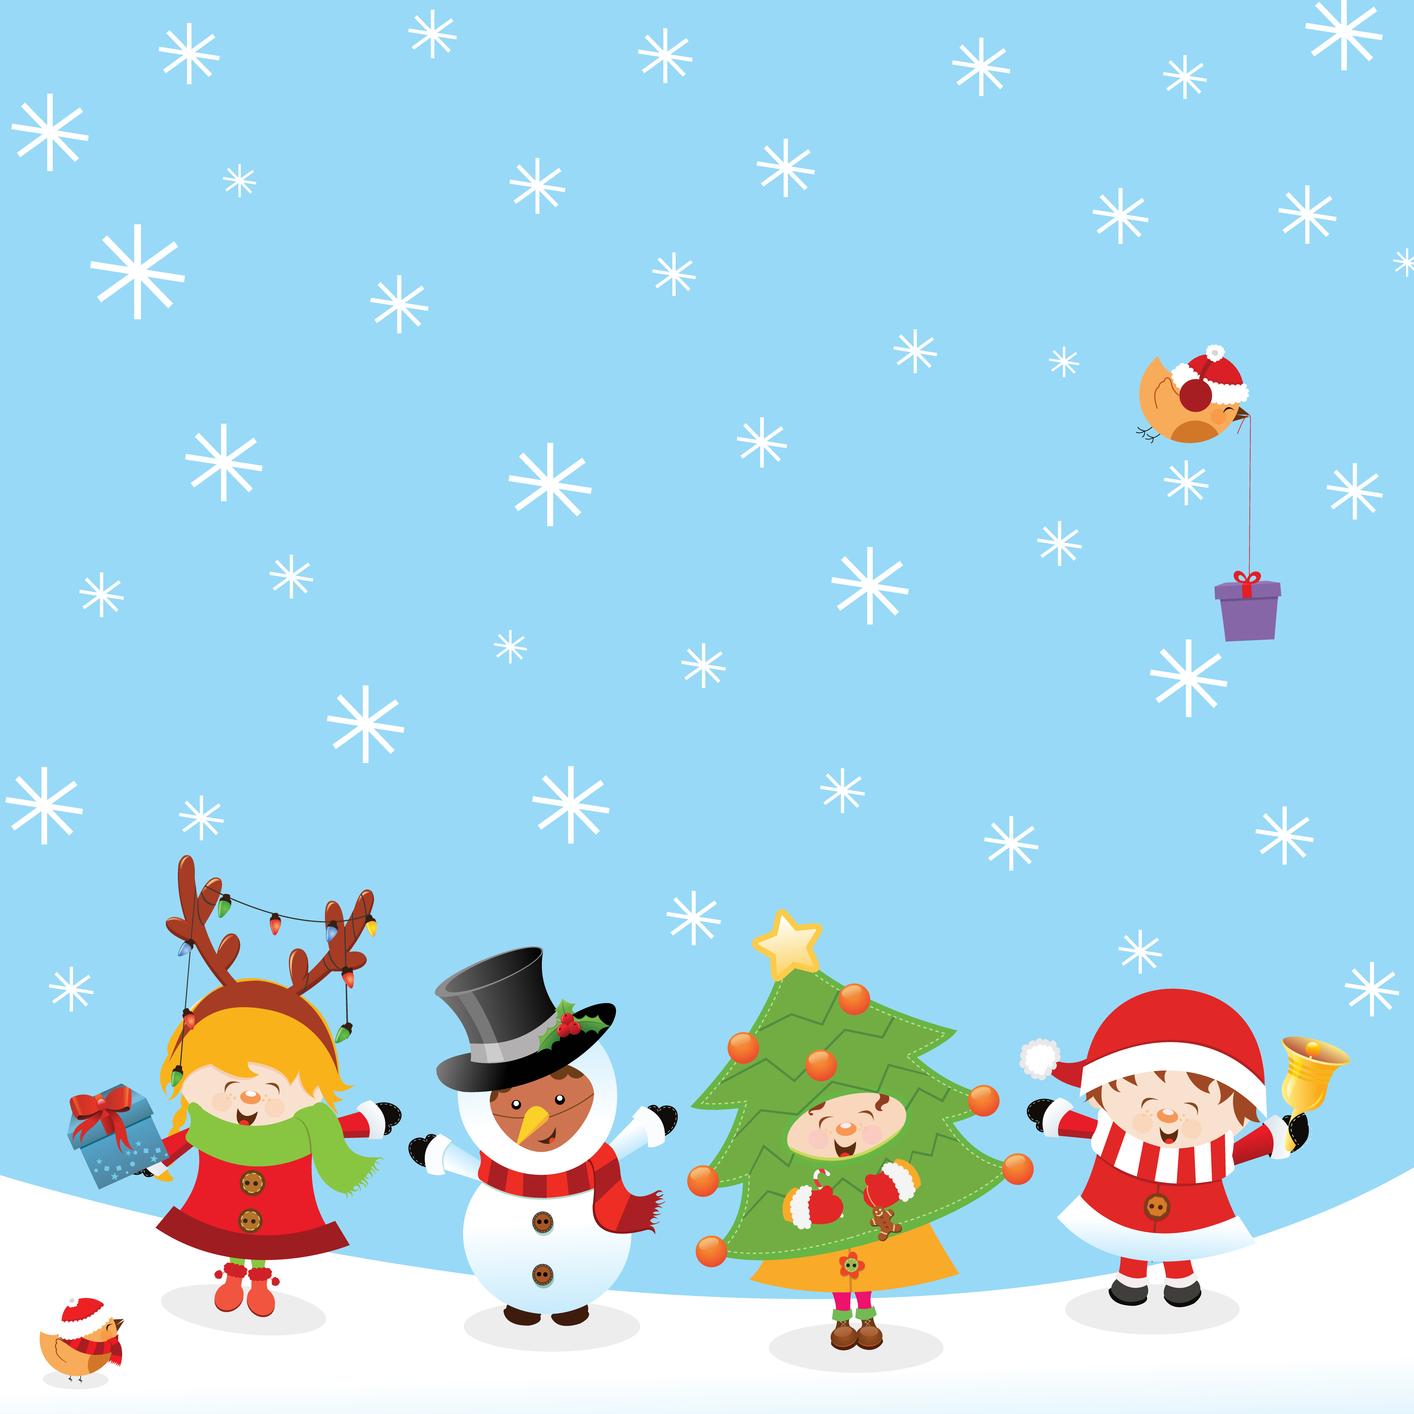 Felicitaciones De Navidad Para Infantil.Tarjetas De Navidad Tarjetas Navidenas Para Felicitar Las